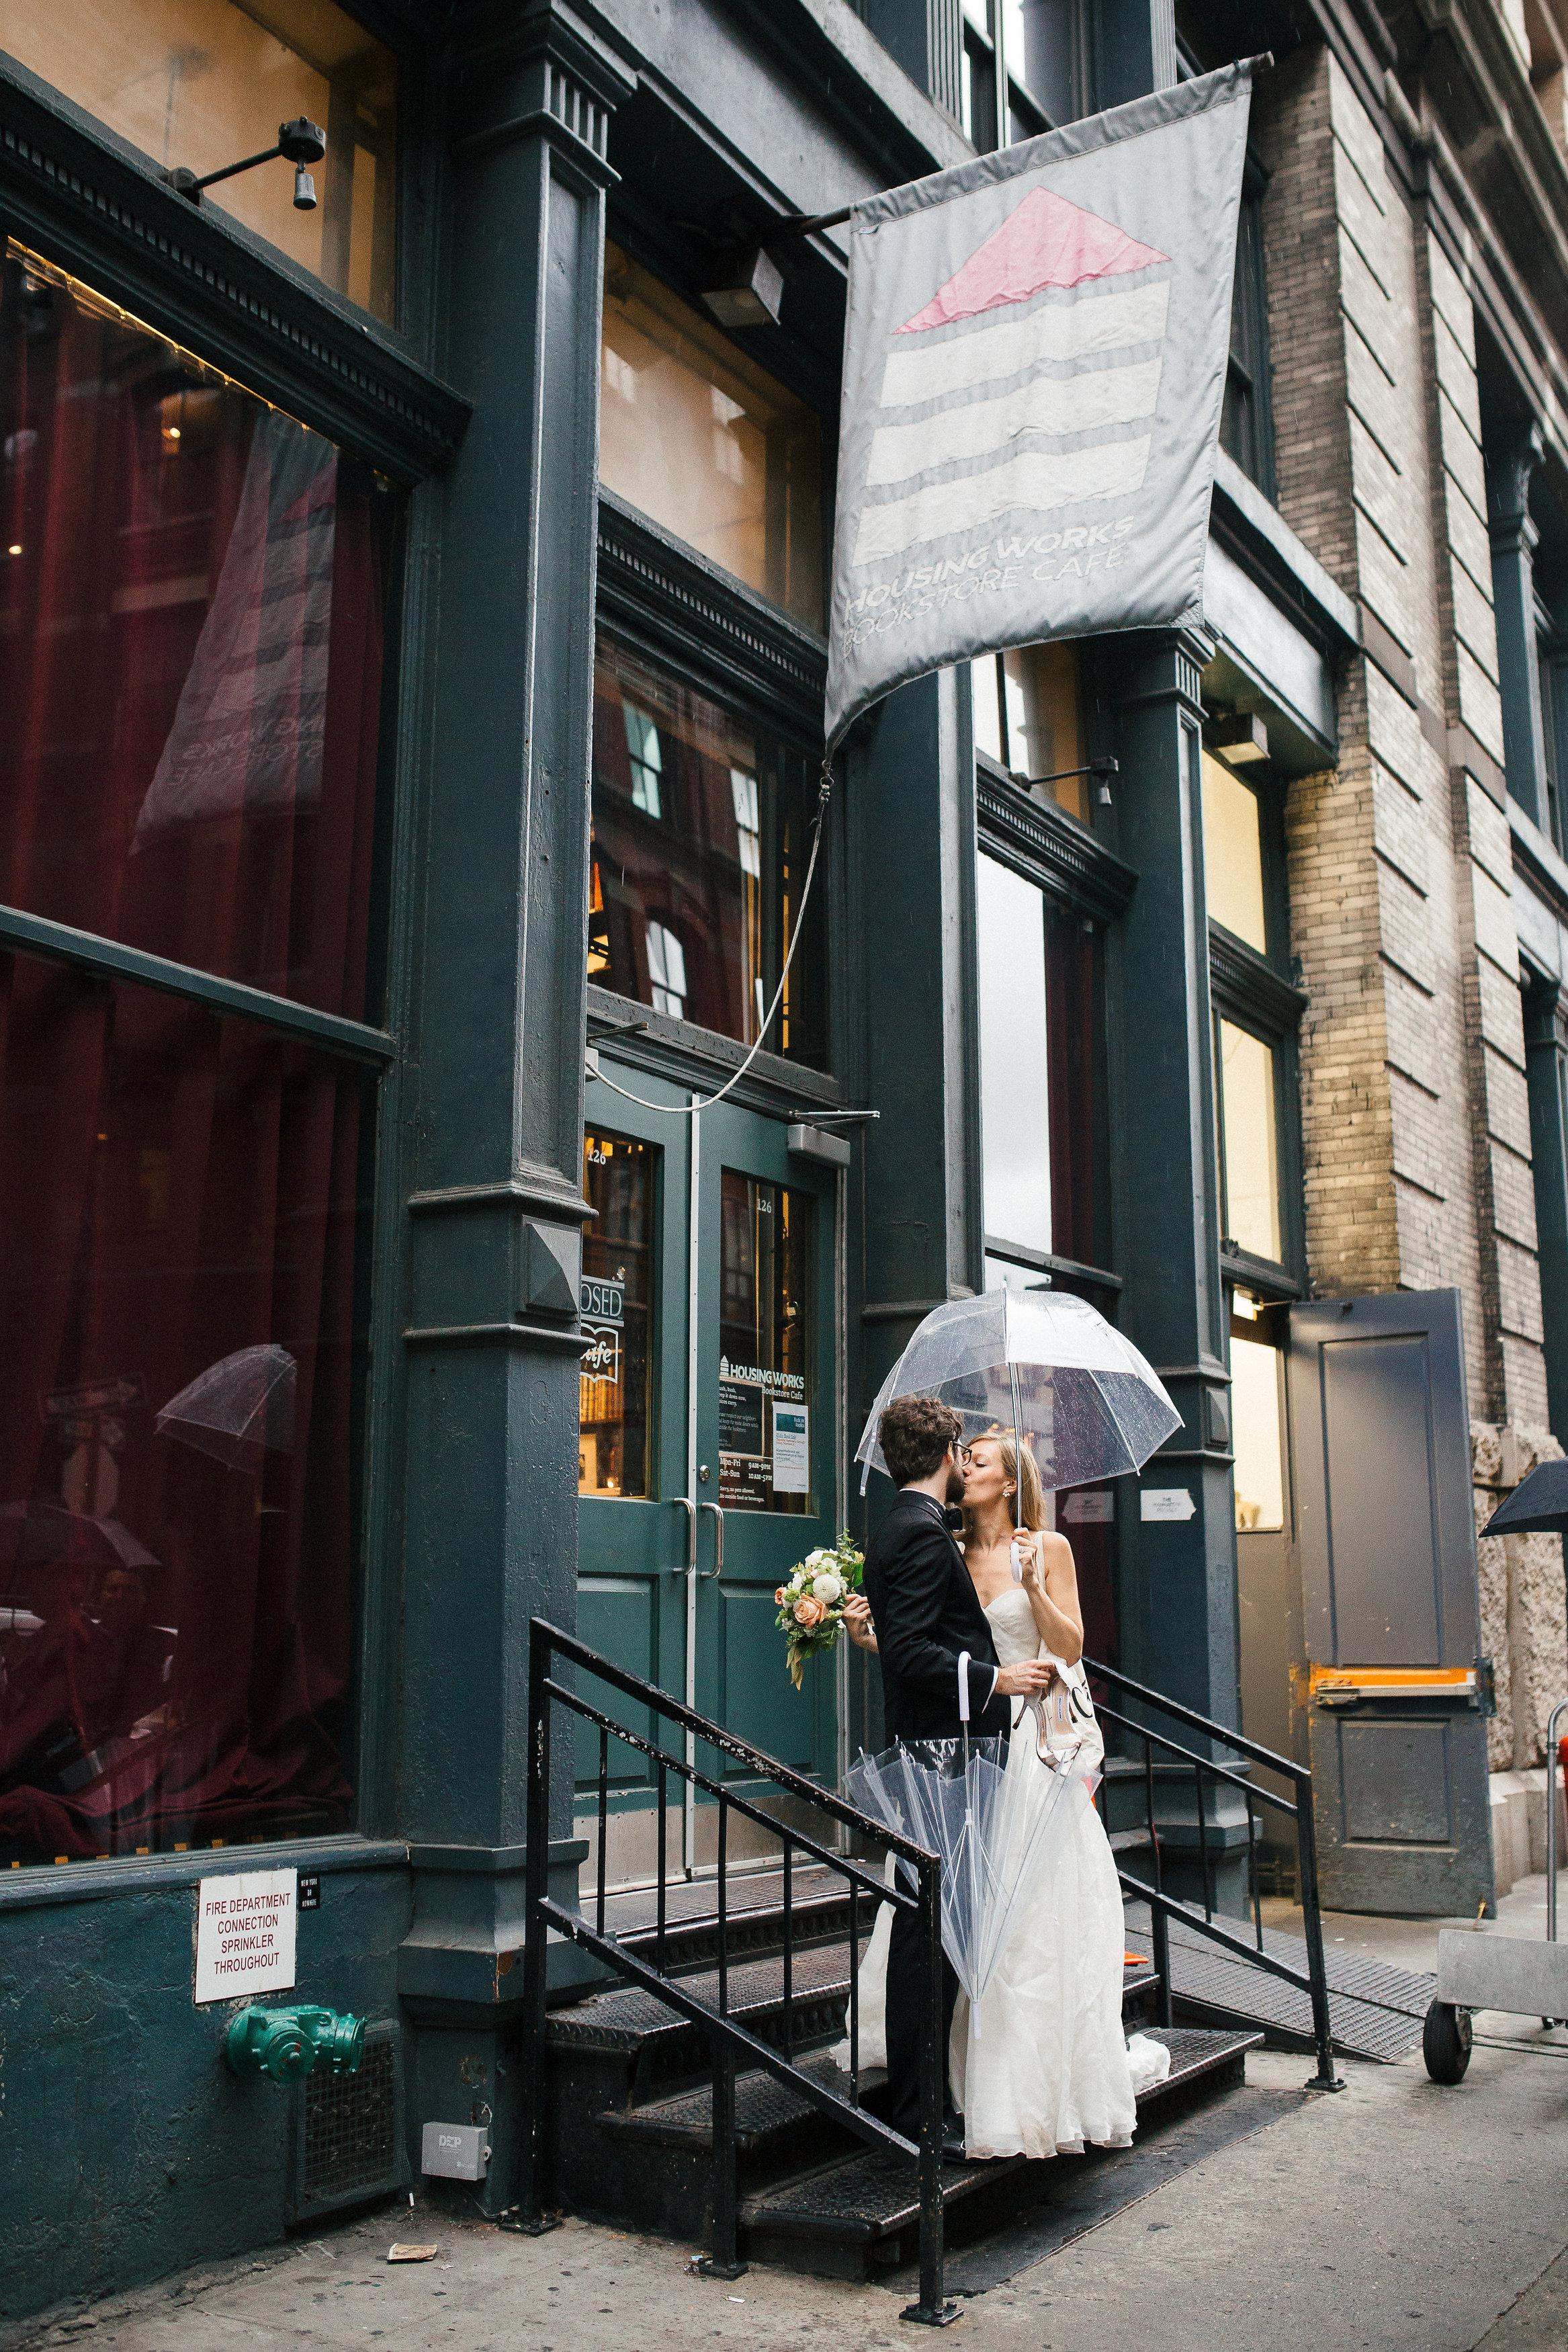 soho-nyc-new-york-wedding-photography-44.jpg